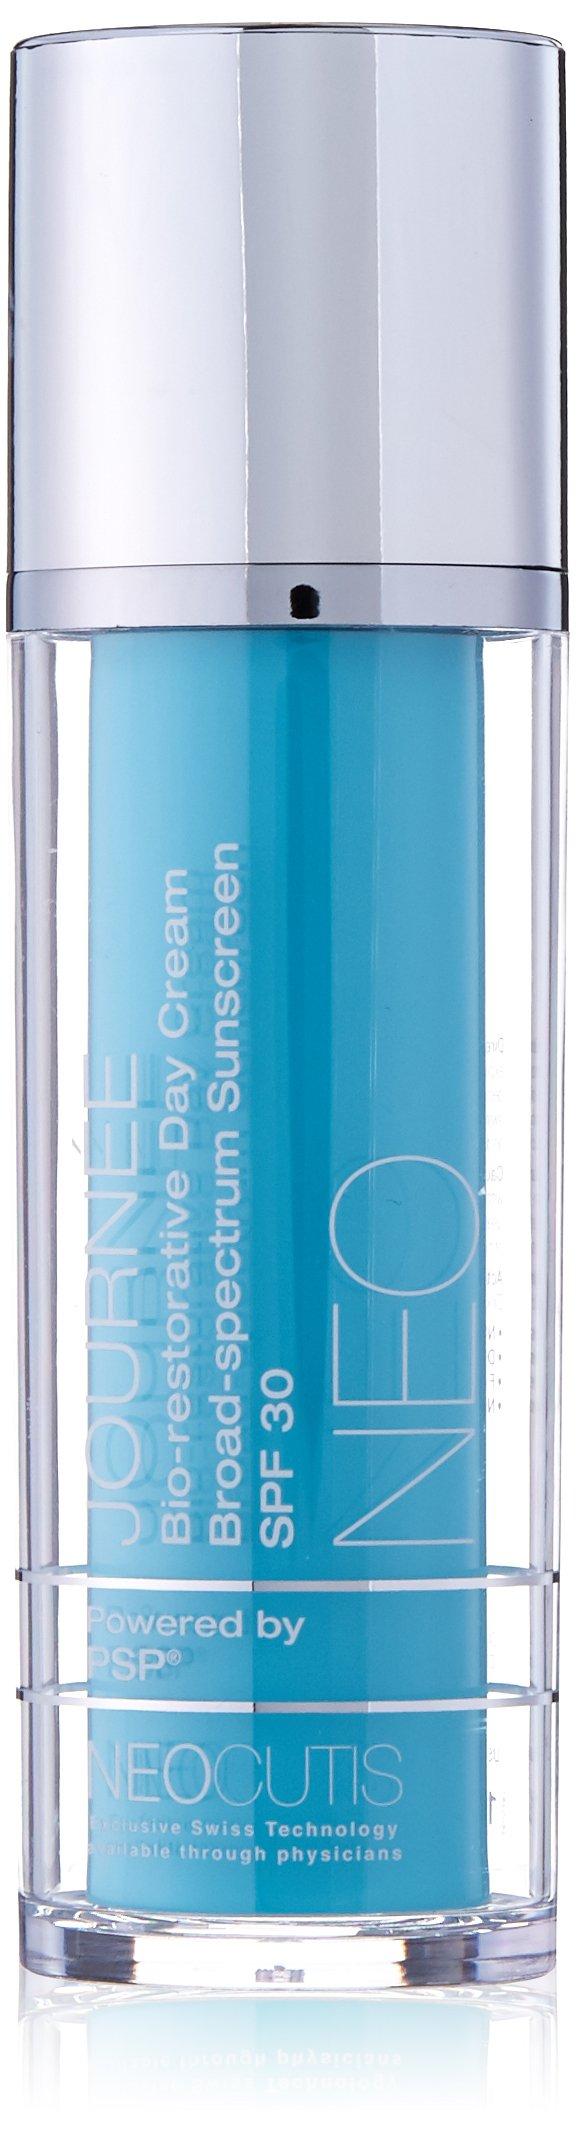 NeoCutis Journée Bio-restorative Broad-spectrum SPF 30 Day Cream Sunscreen, 1.69 fl. oz.